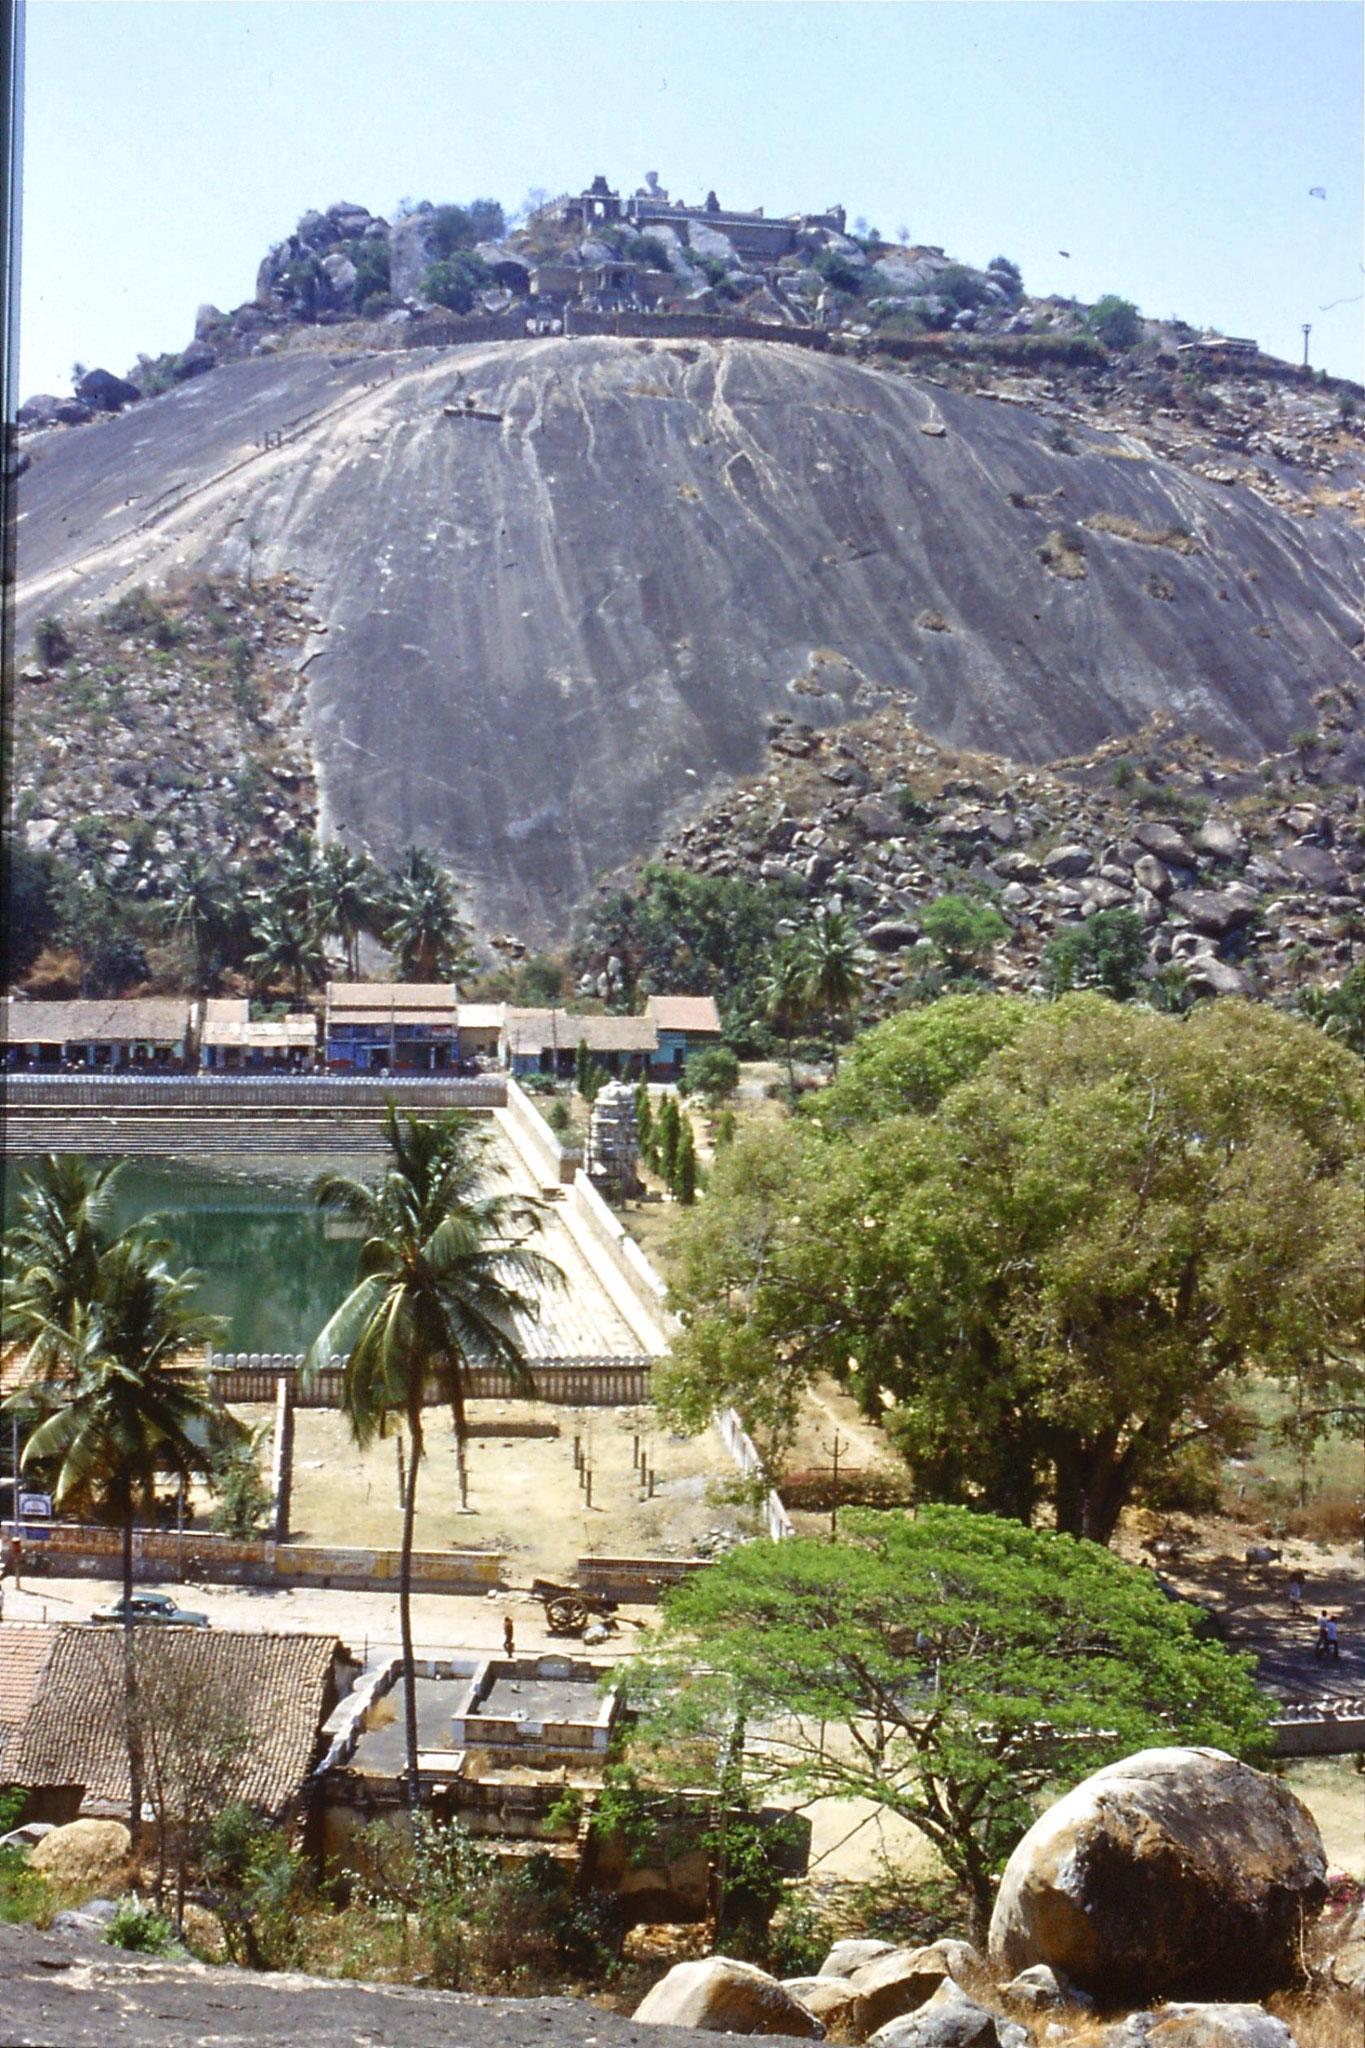 108/16: 13/3/1990 Sravanabelagola - temple hill